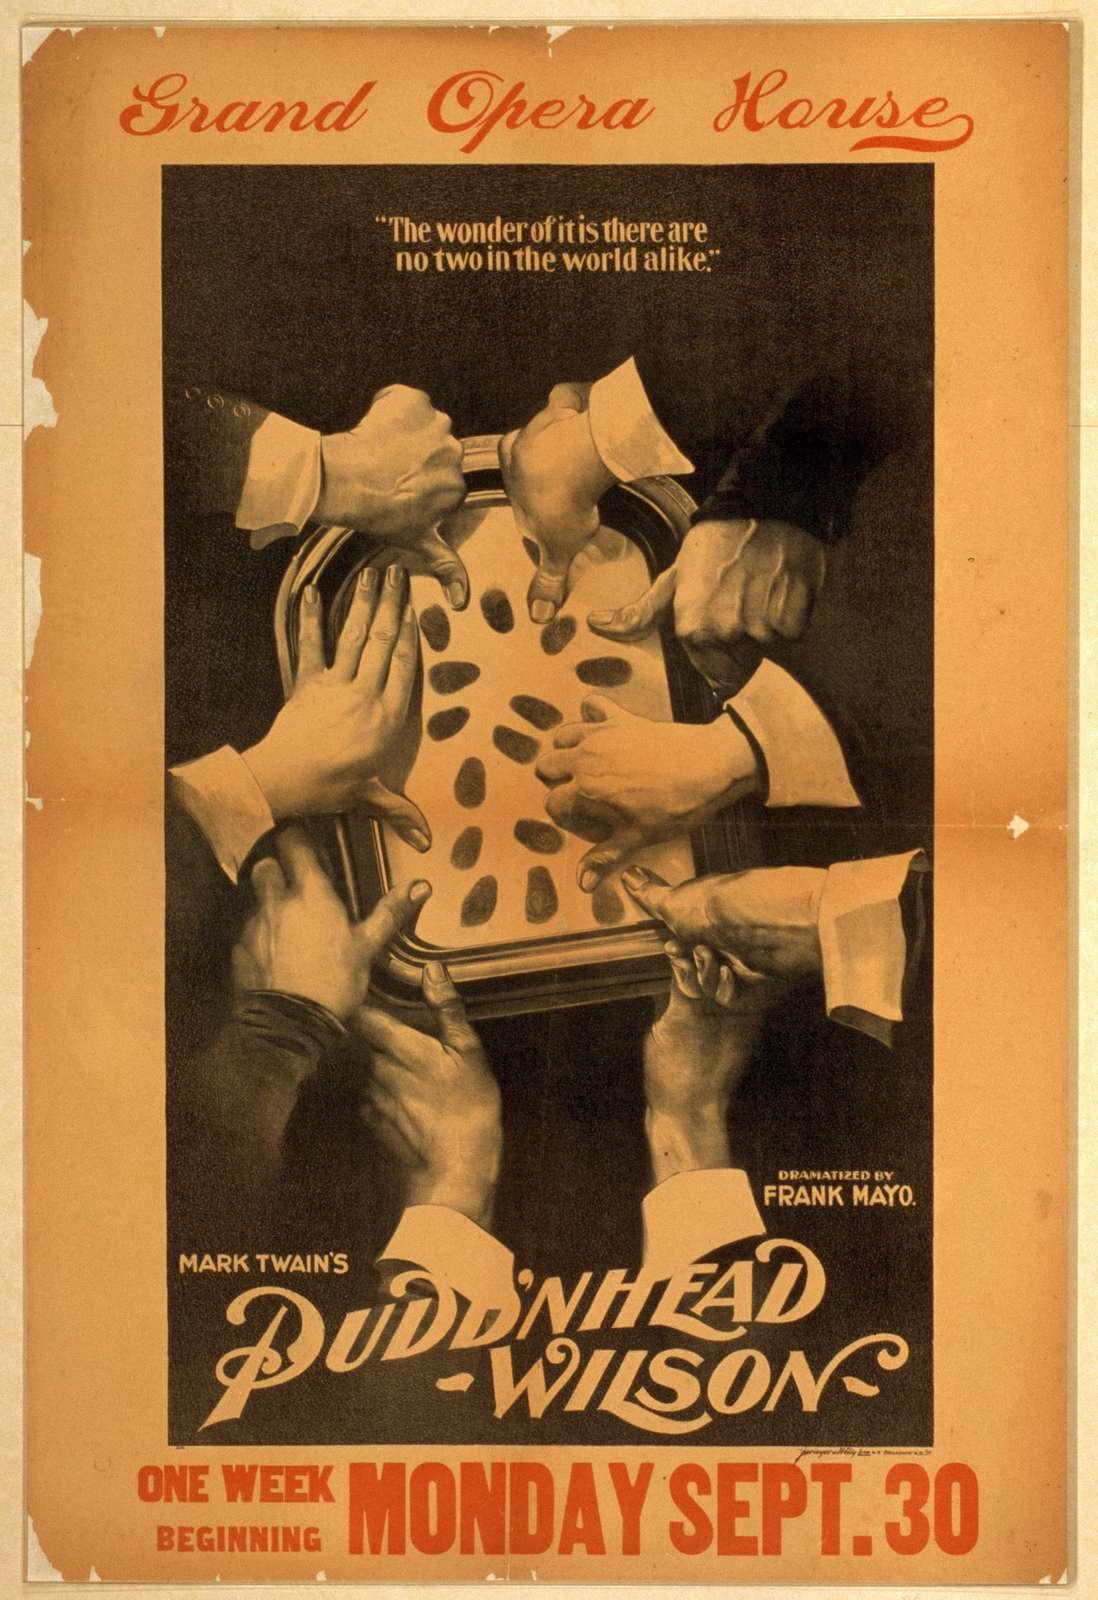 Mark Twain's Pudd'nhead Wilson dramatized by Frank Mayo.